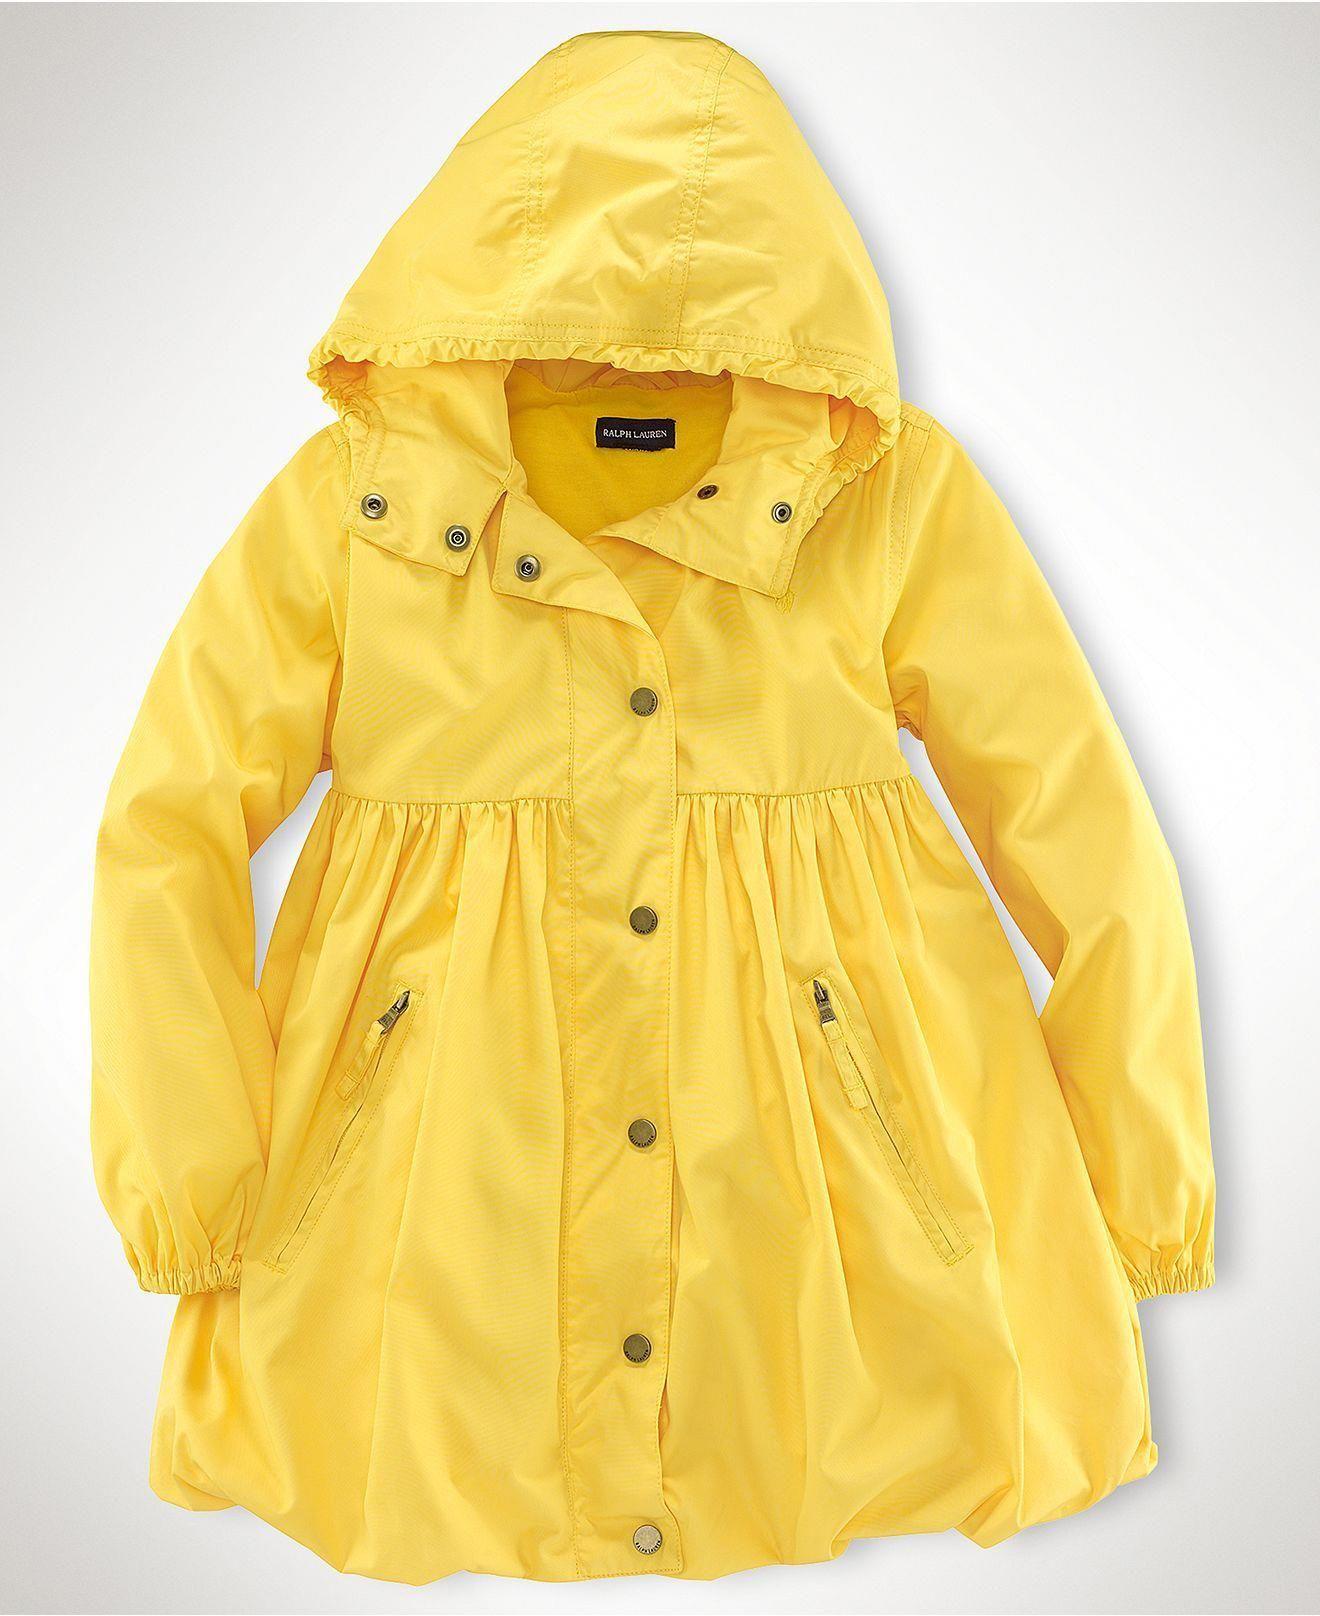 4bf3b1ae Classic yellow raincoat with a feminine twist - so darling! Ralph Lauren  Kids Jacket,